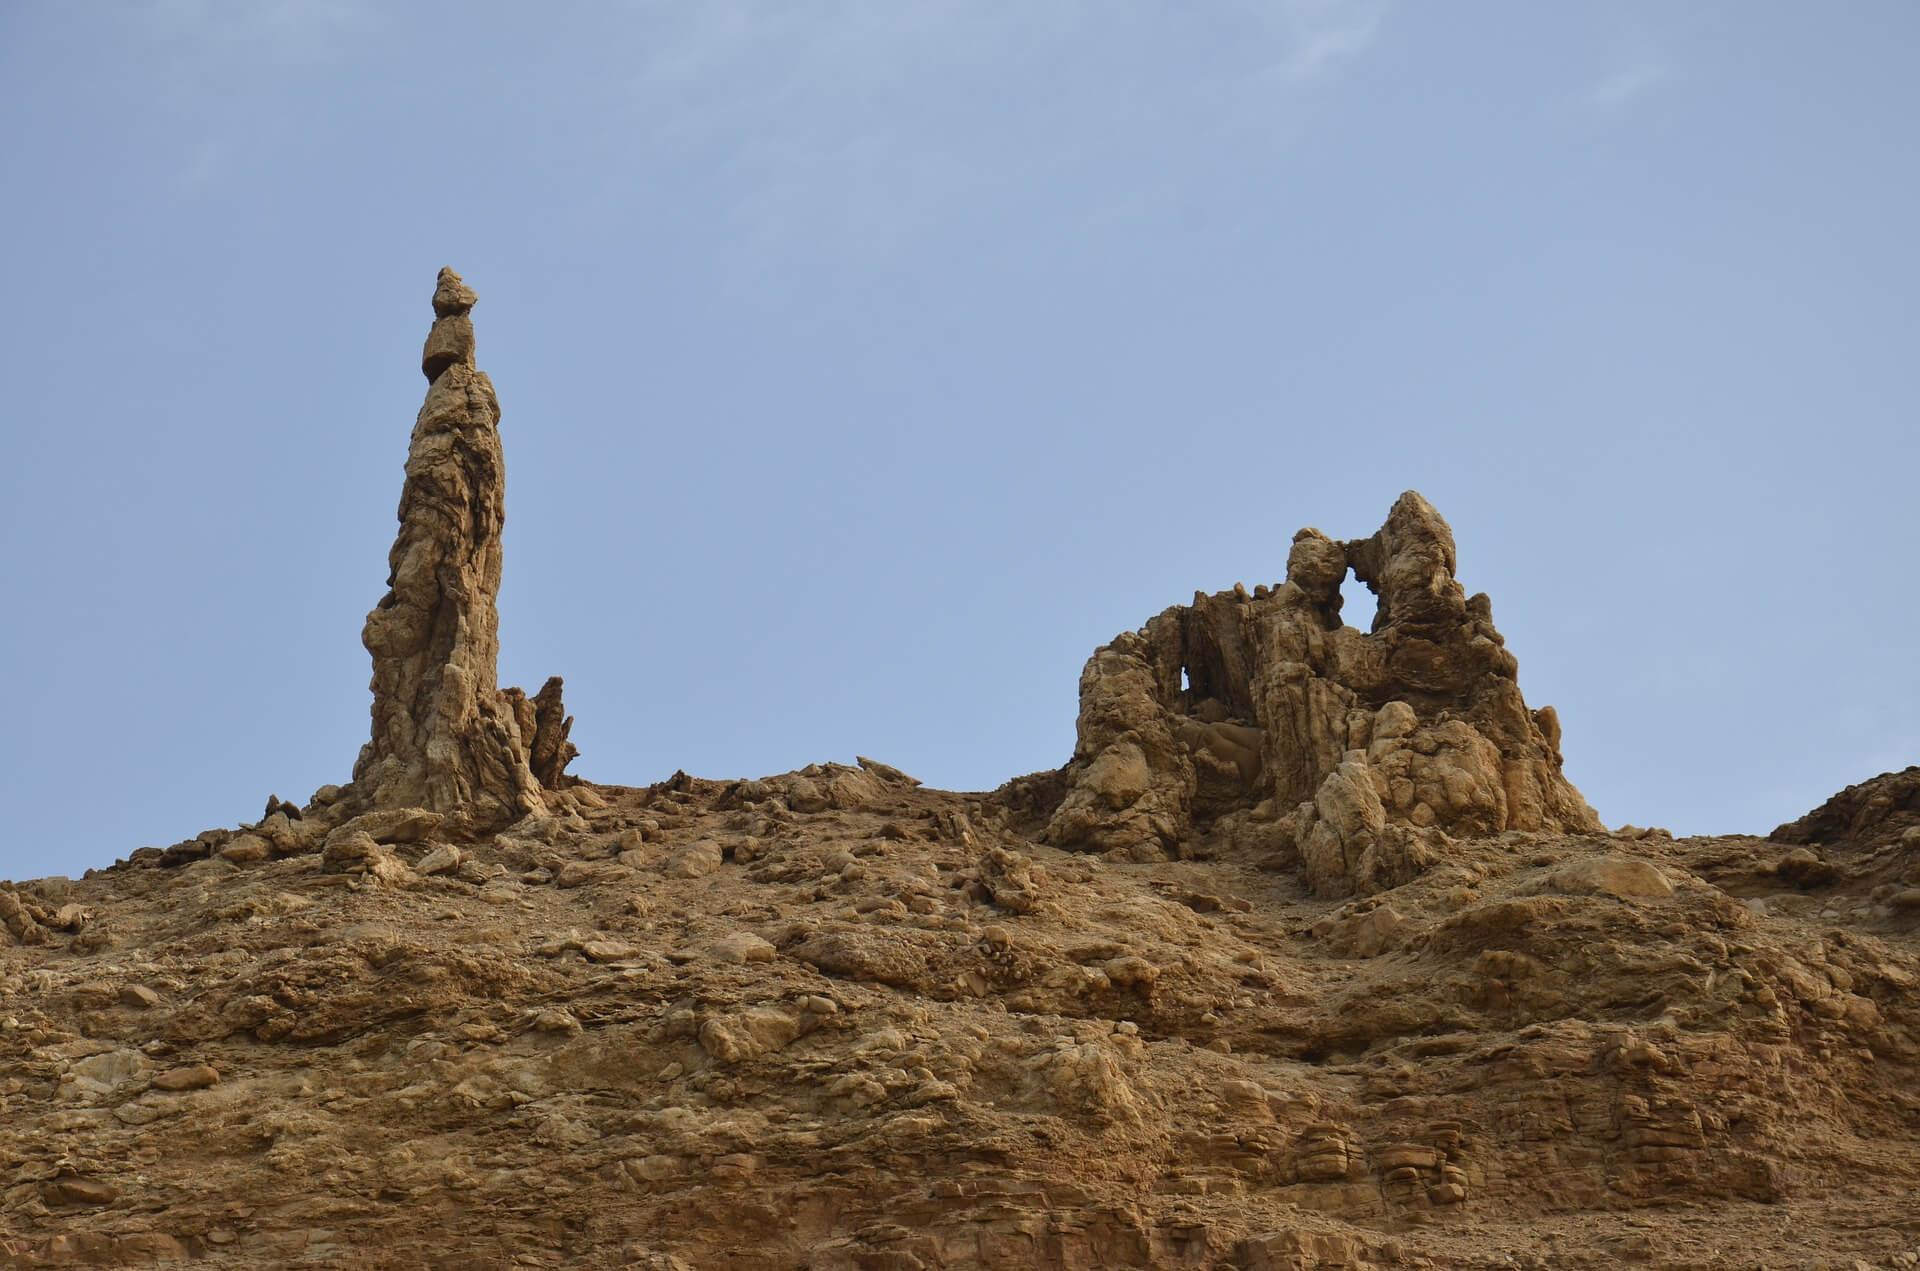 Salzsäule in Israel. Symbolbild für Lot